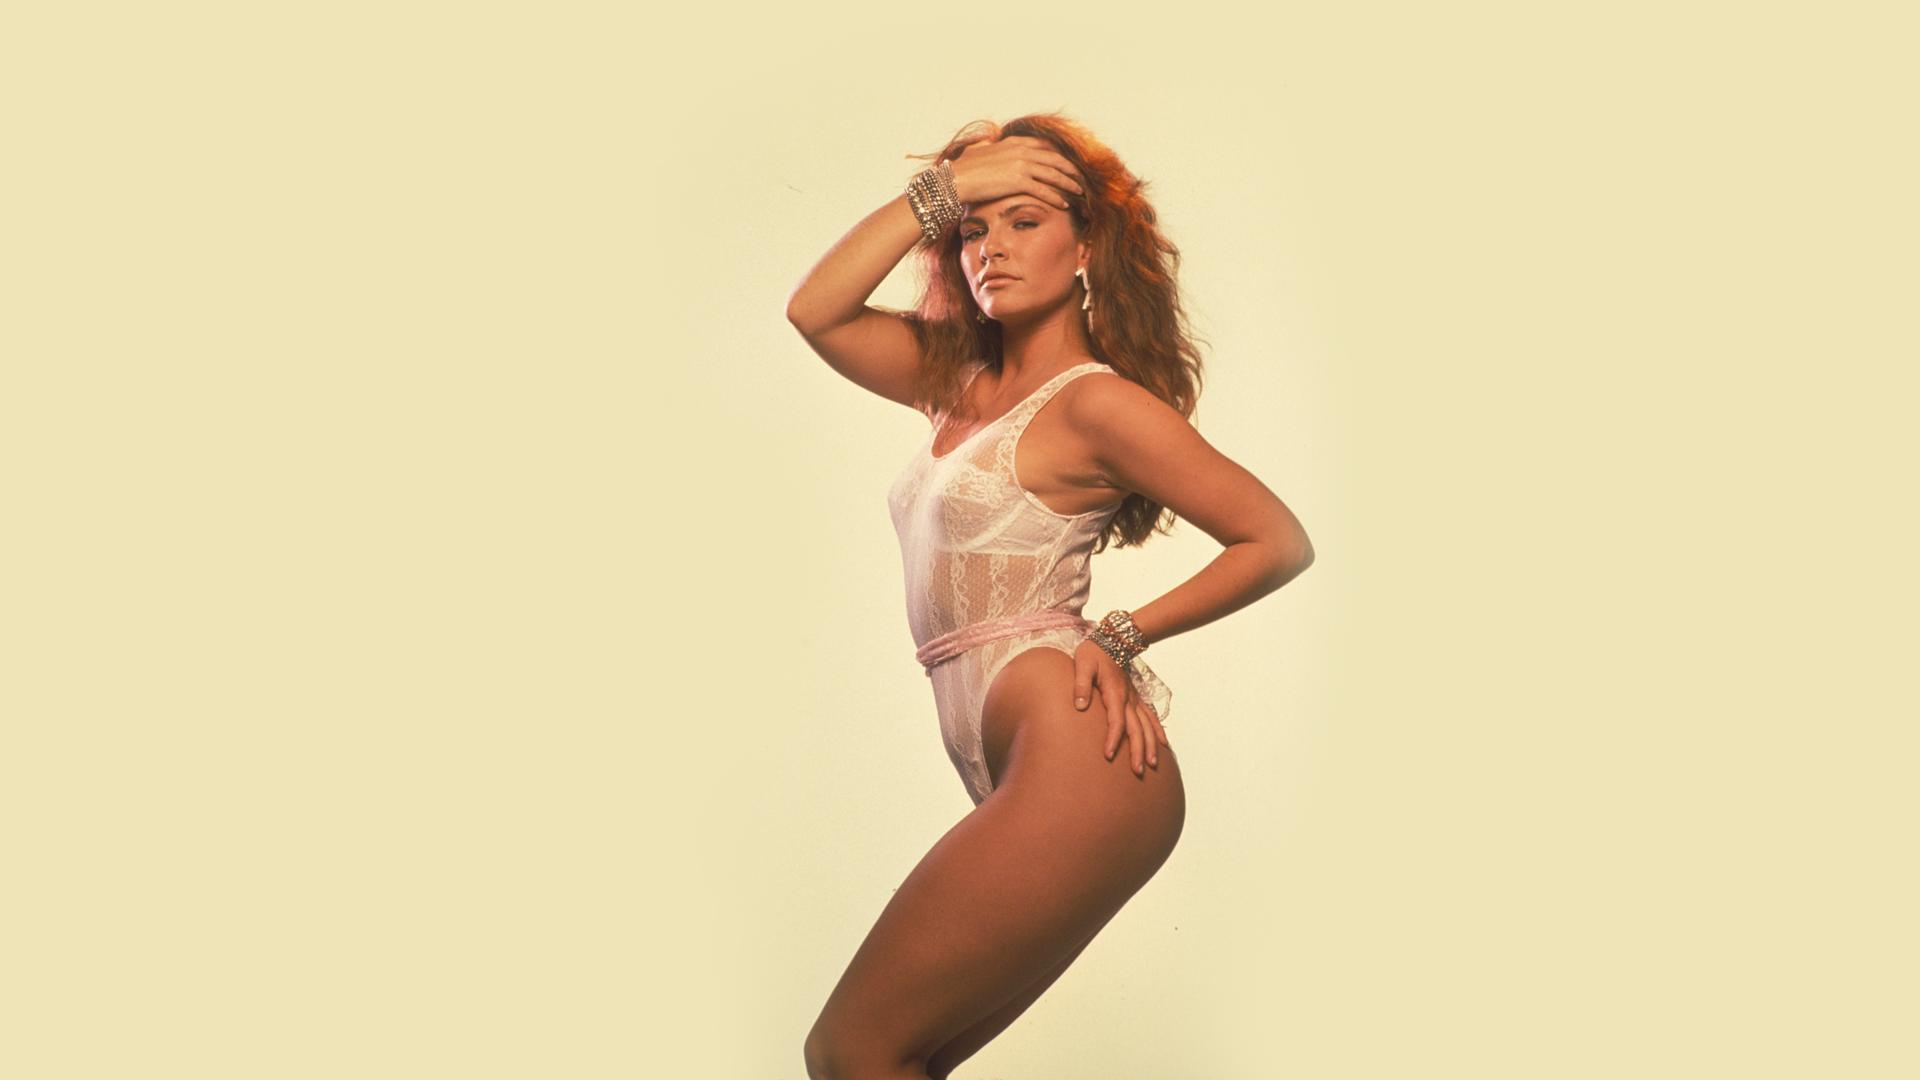 Bikini Tawny Kitaen nude photos 2019